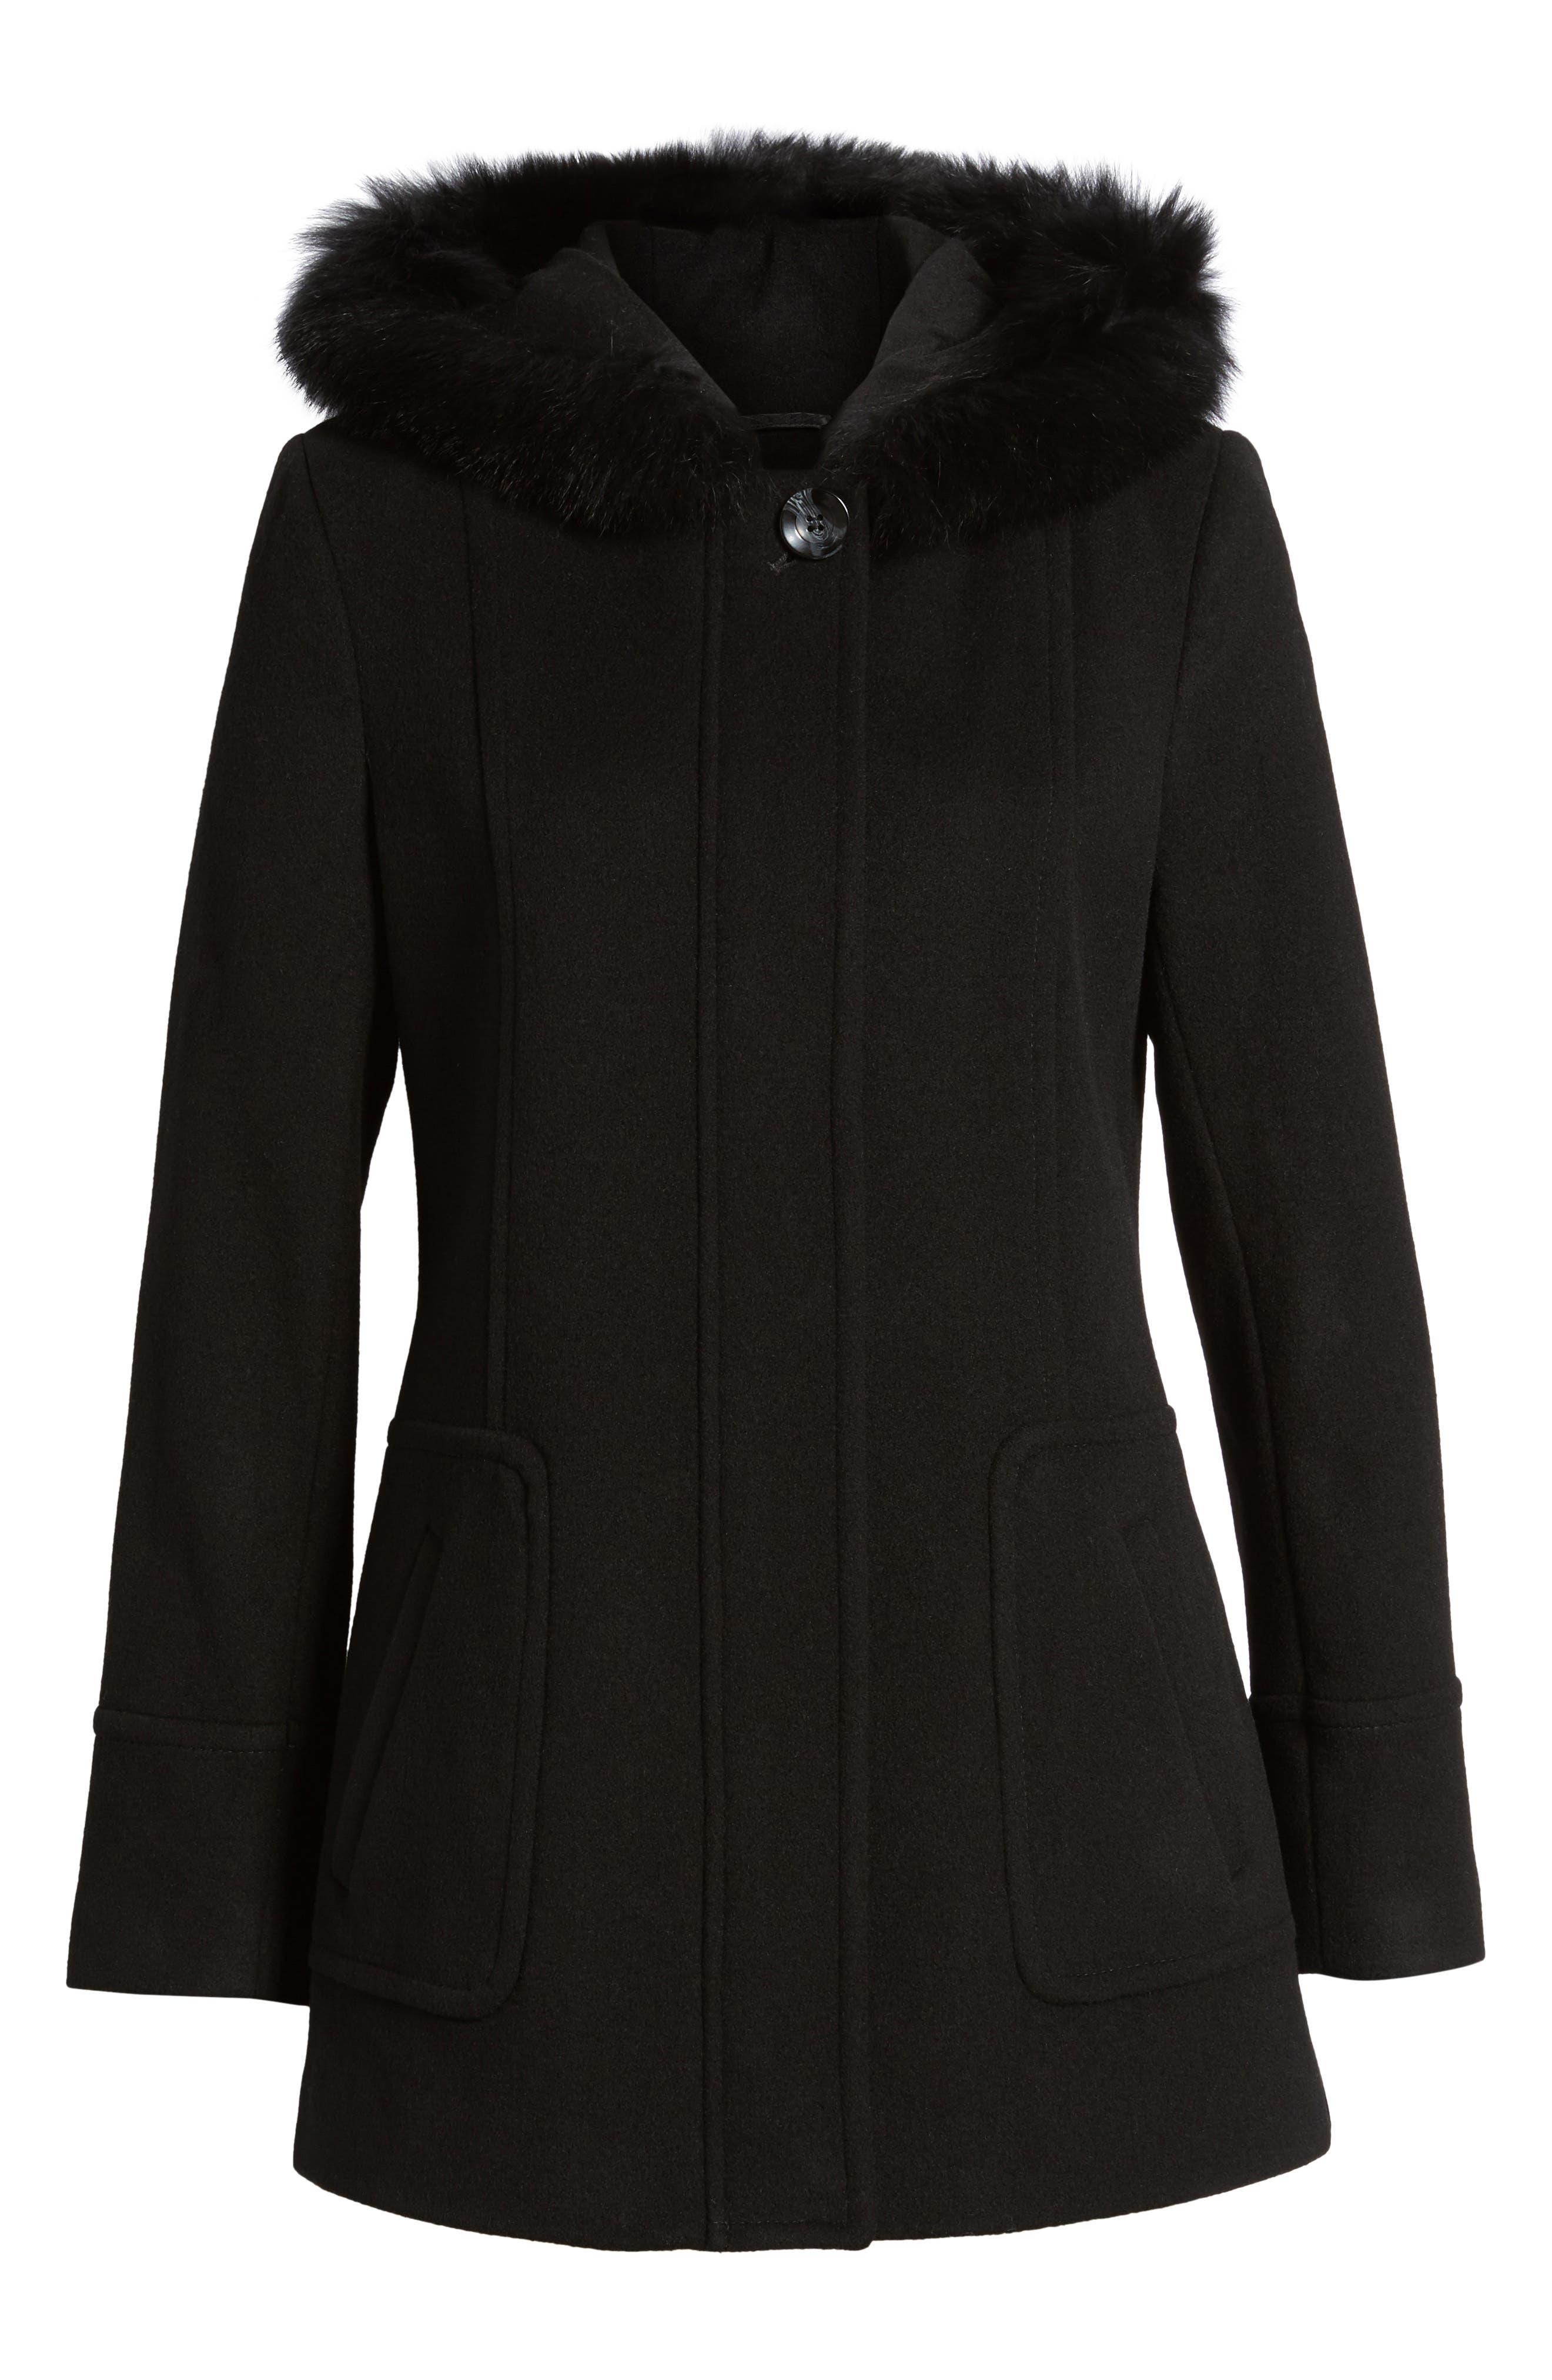 Hooded Wool Blend Coat with Genuine Fox Fur Trim,                             Alternate thumbnail 6, color,                             Black